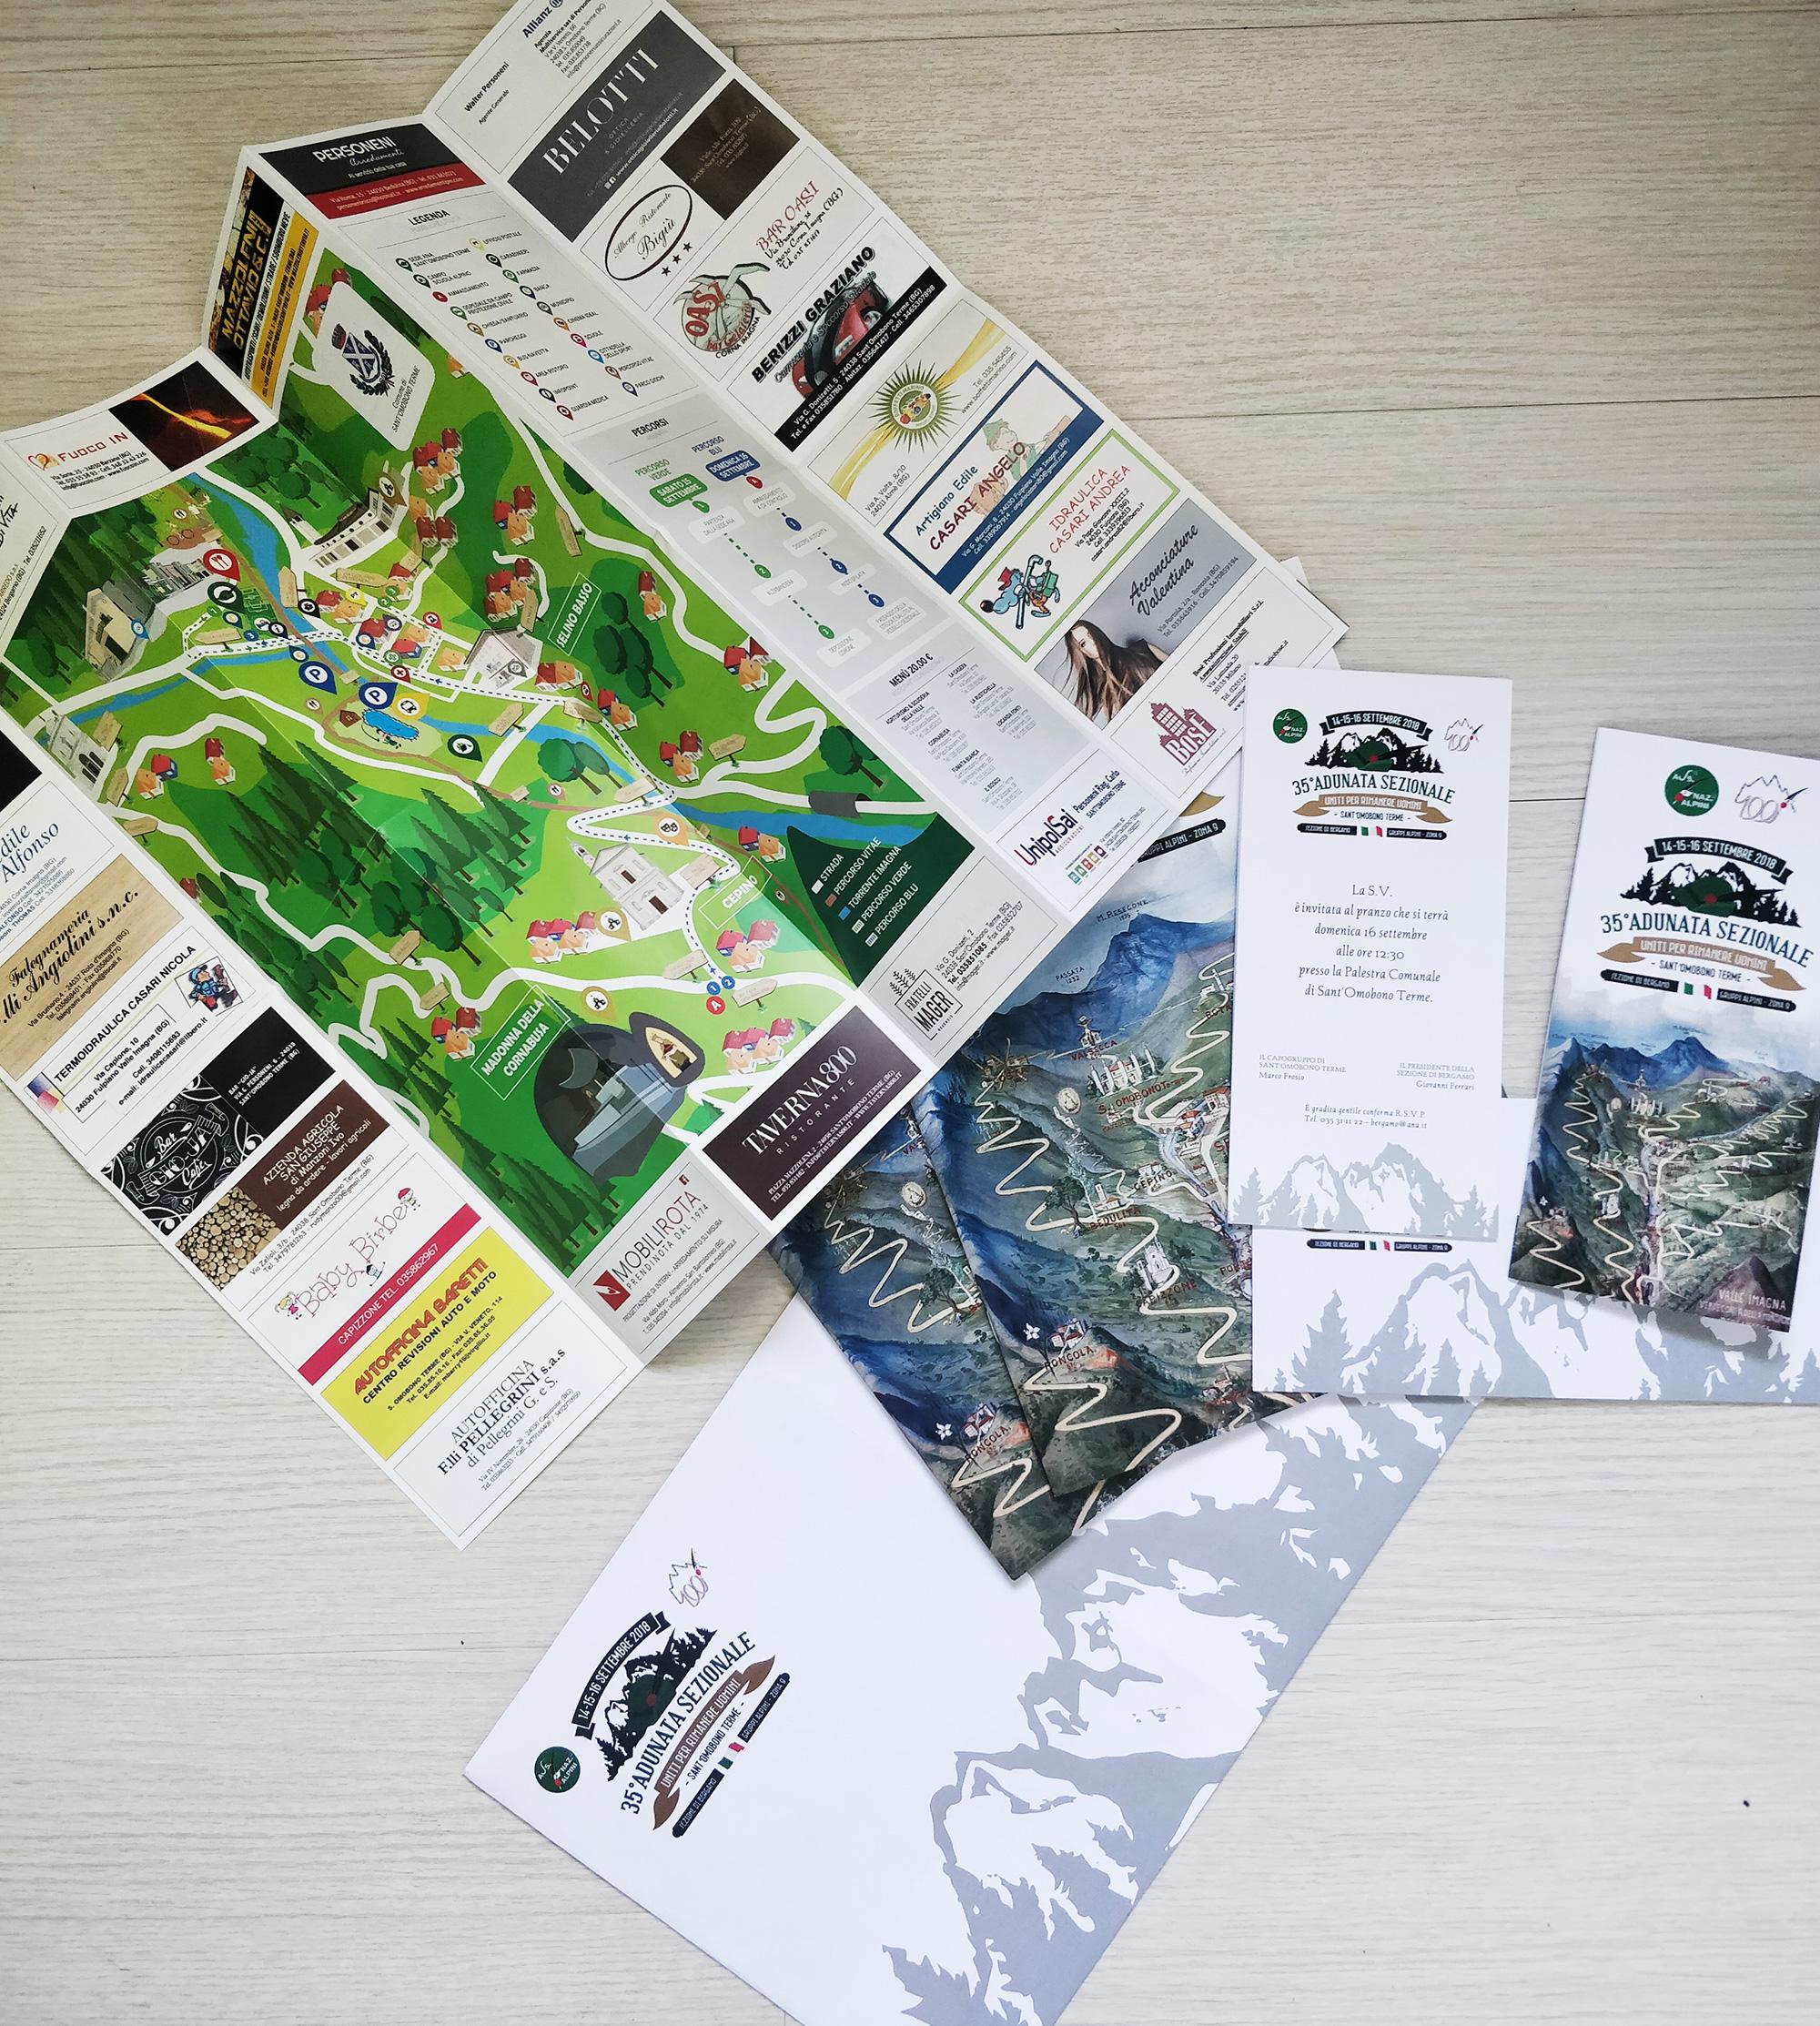 Alpini – 35° Adunata Sezionale – Valle Imagna